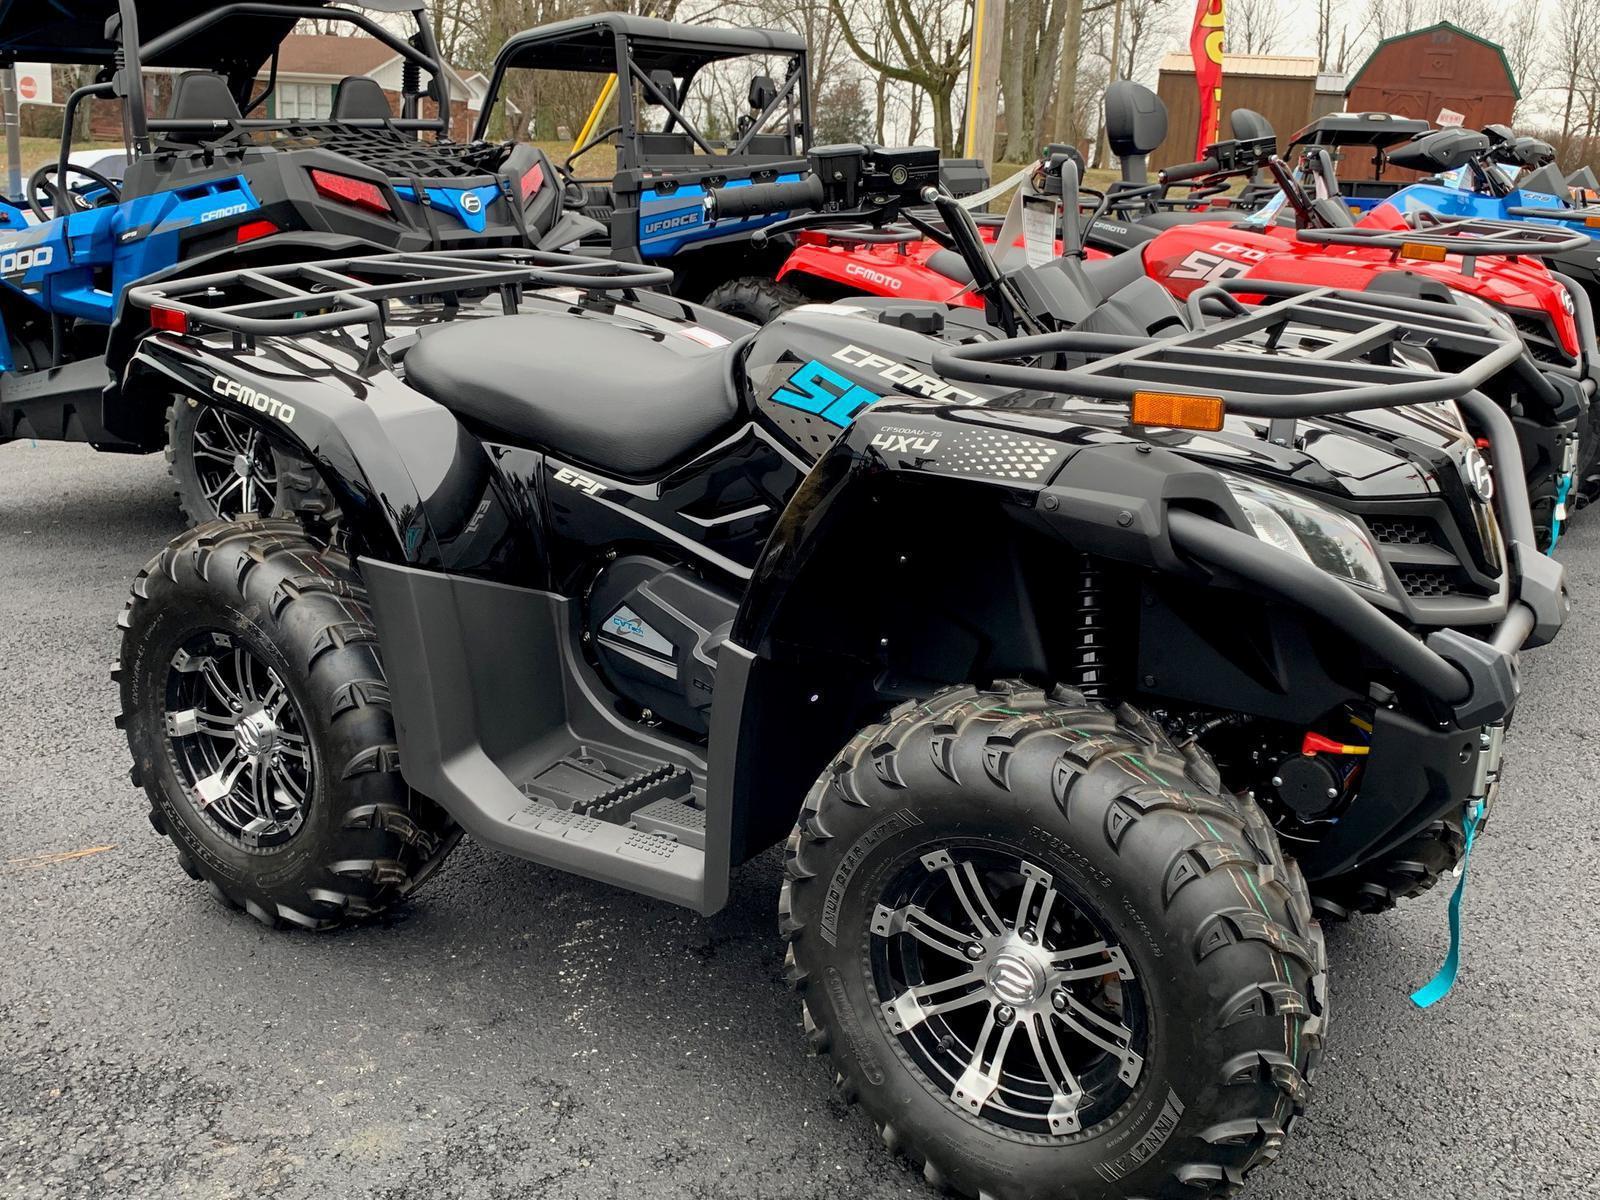 2019 CFMOTO CFORCE 500S 4x4 ATV SALE + NO FEES